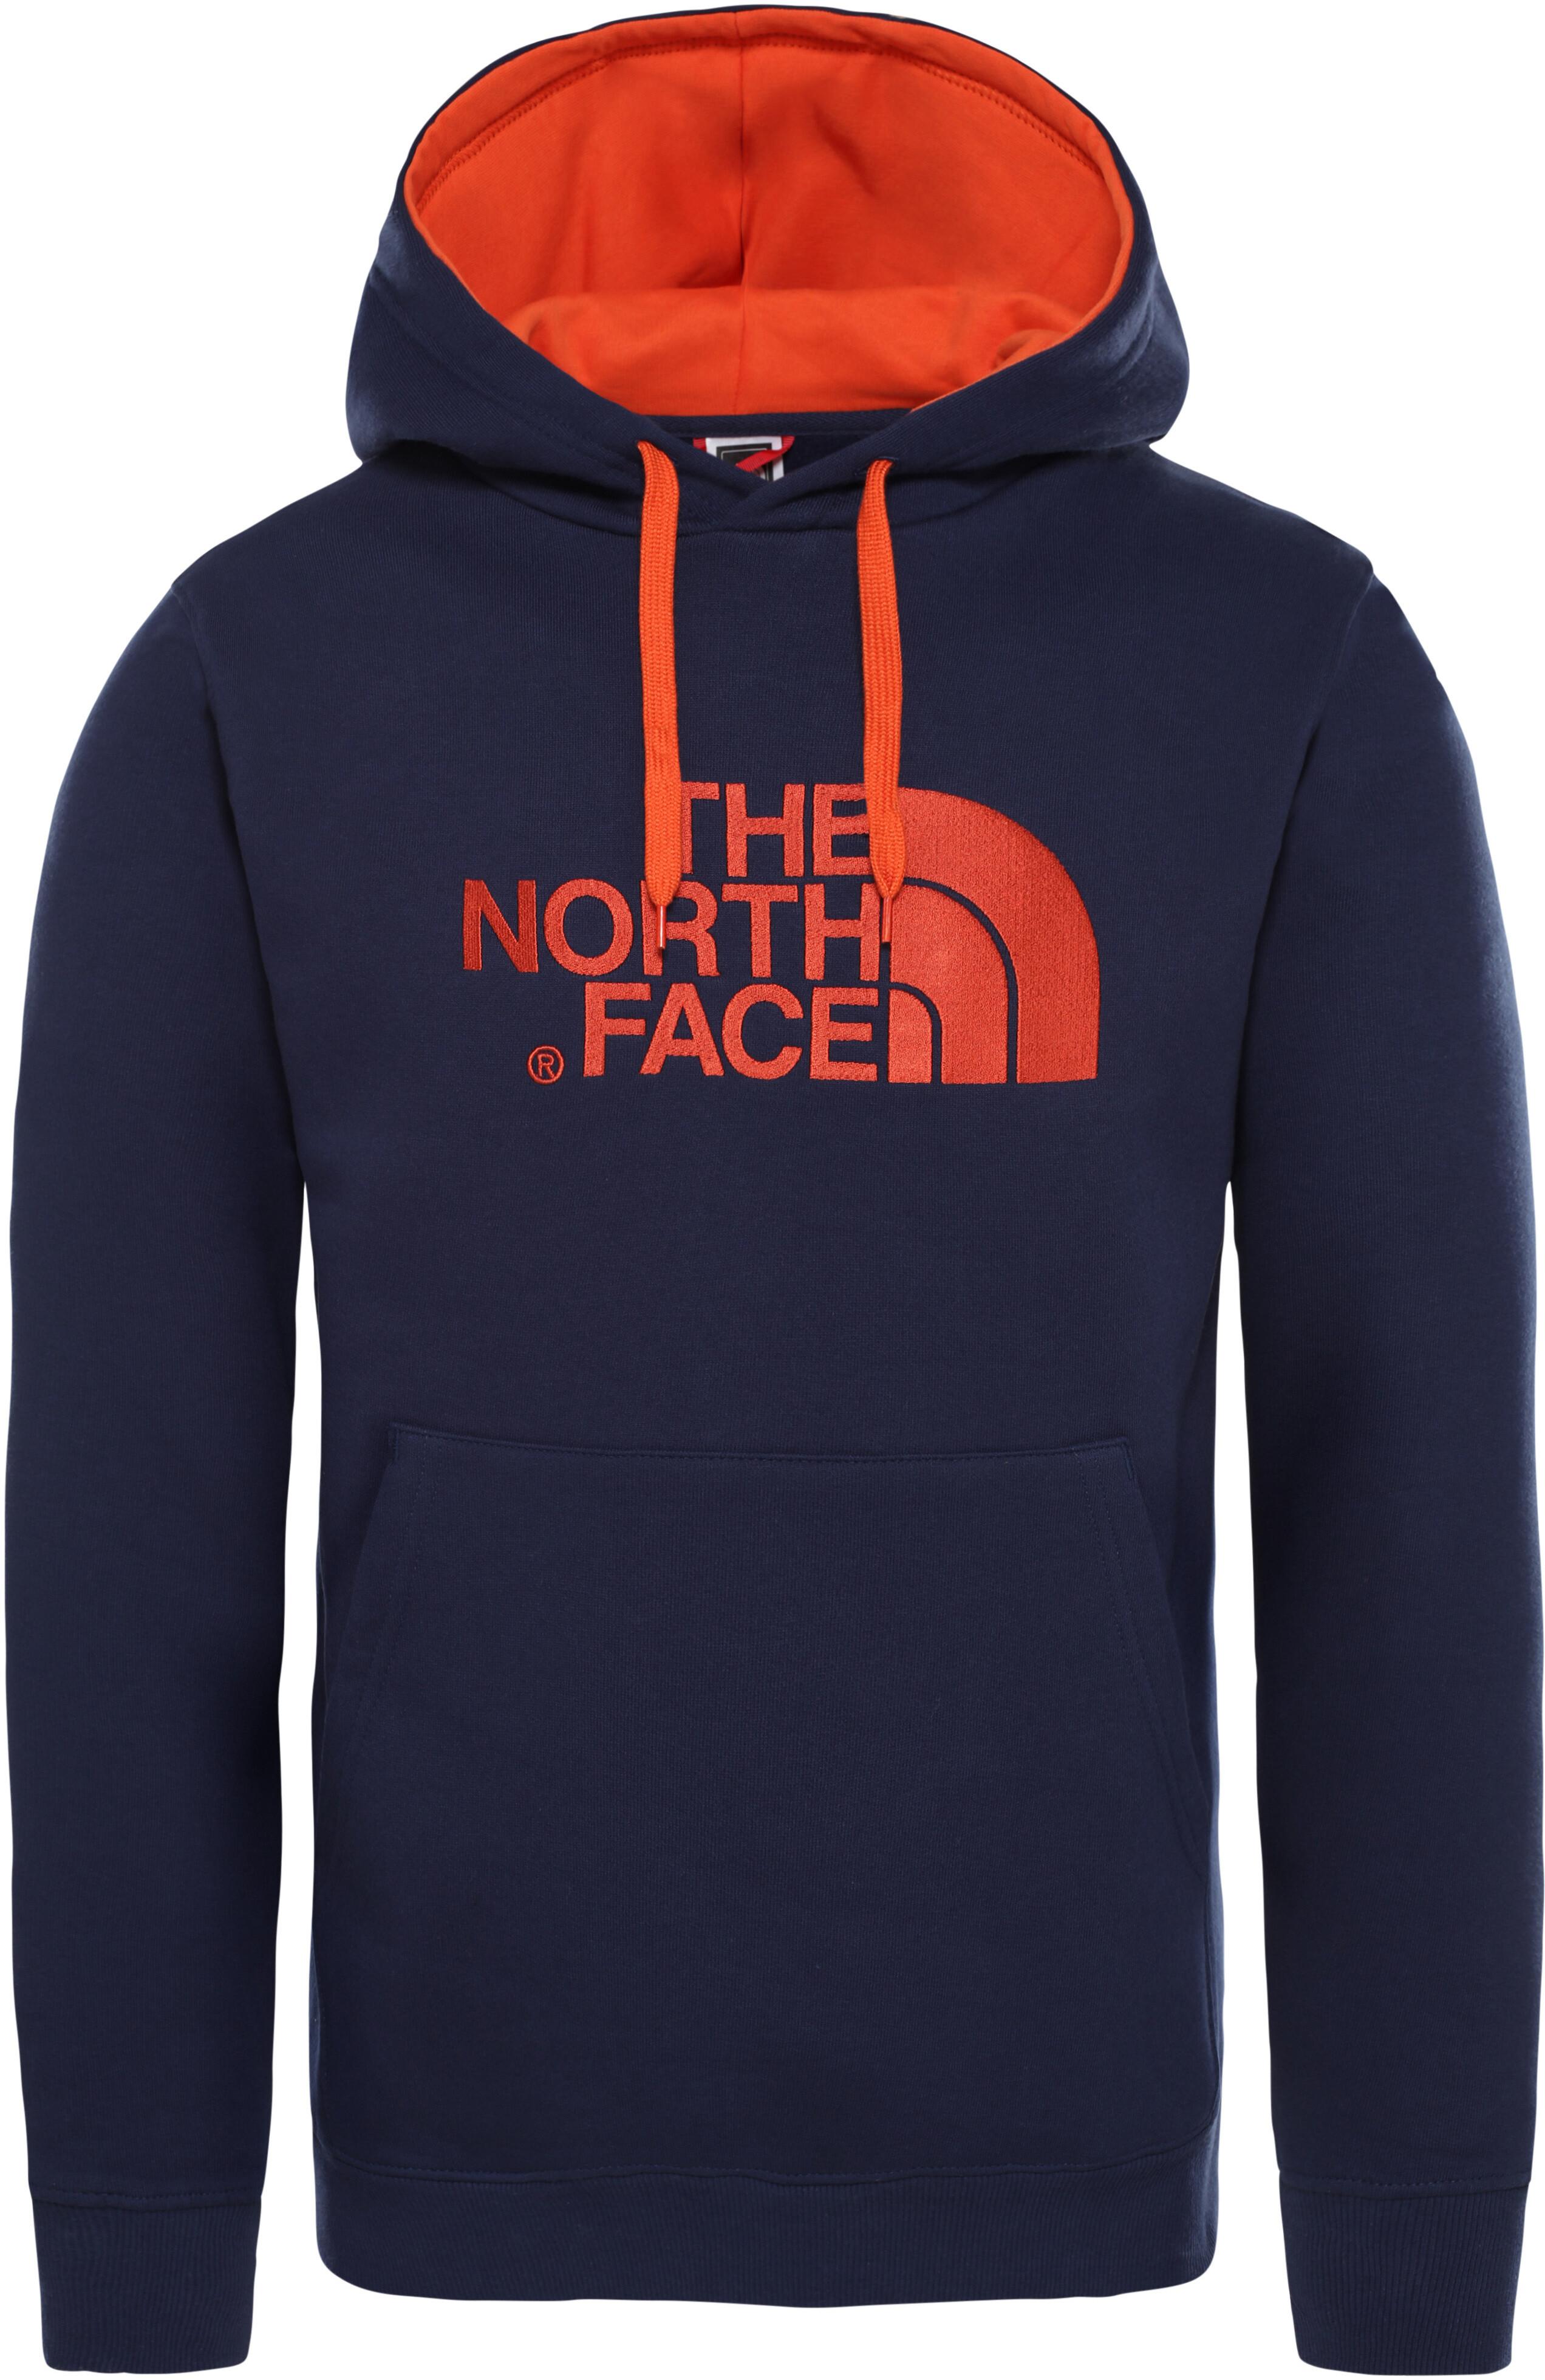 low priced 8b6e8 b7493 The North Face Drew Peak Pullover Hoodie Herren montague blue